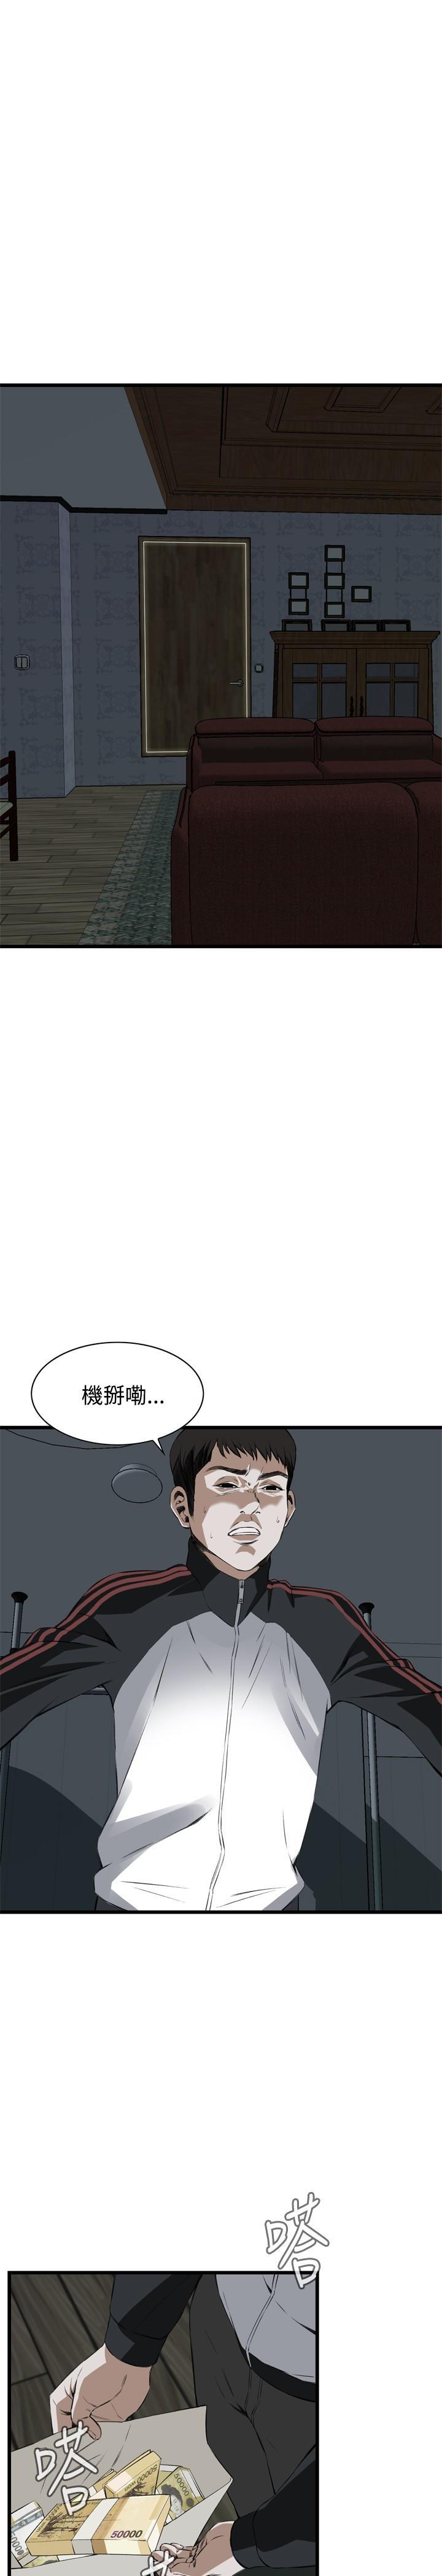 Take a Peek 偷窥 Ch.39~55 [Chinese]中文 482